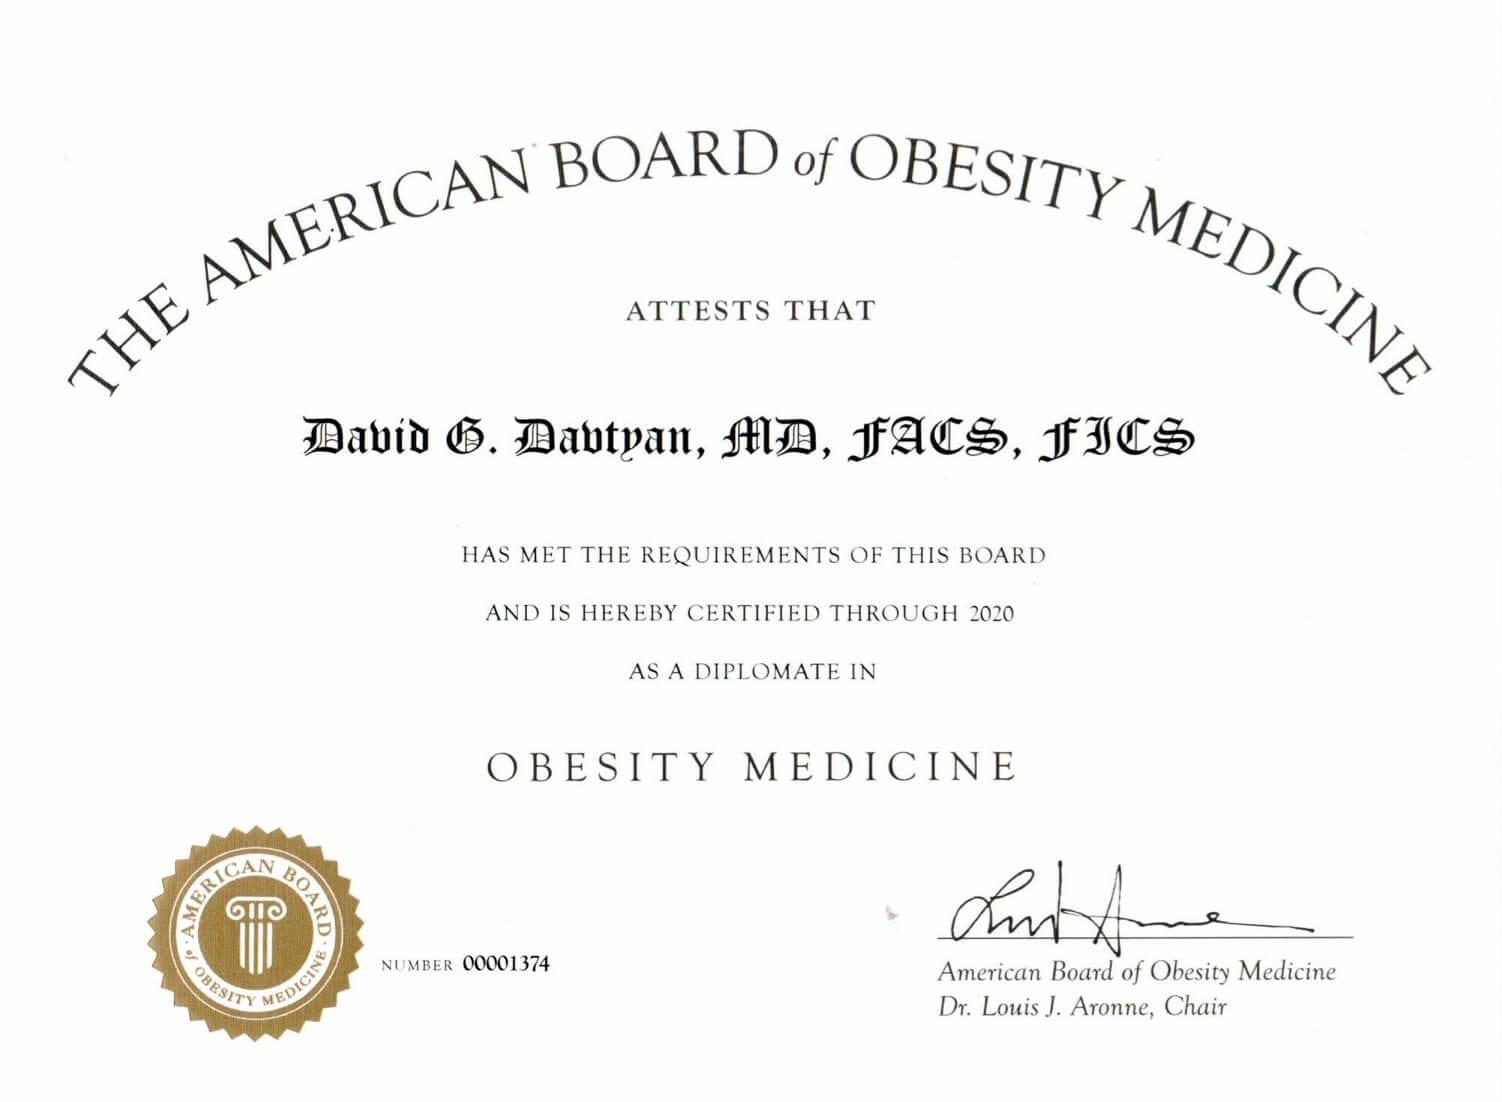 Dr. David G. Davtyan's 2019 American Board of Obesity Medicine Diplomate Certificate